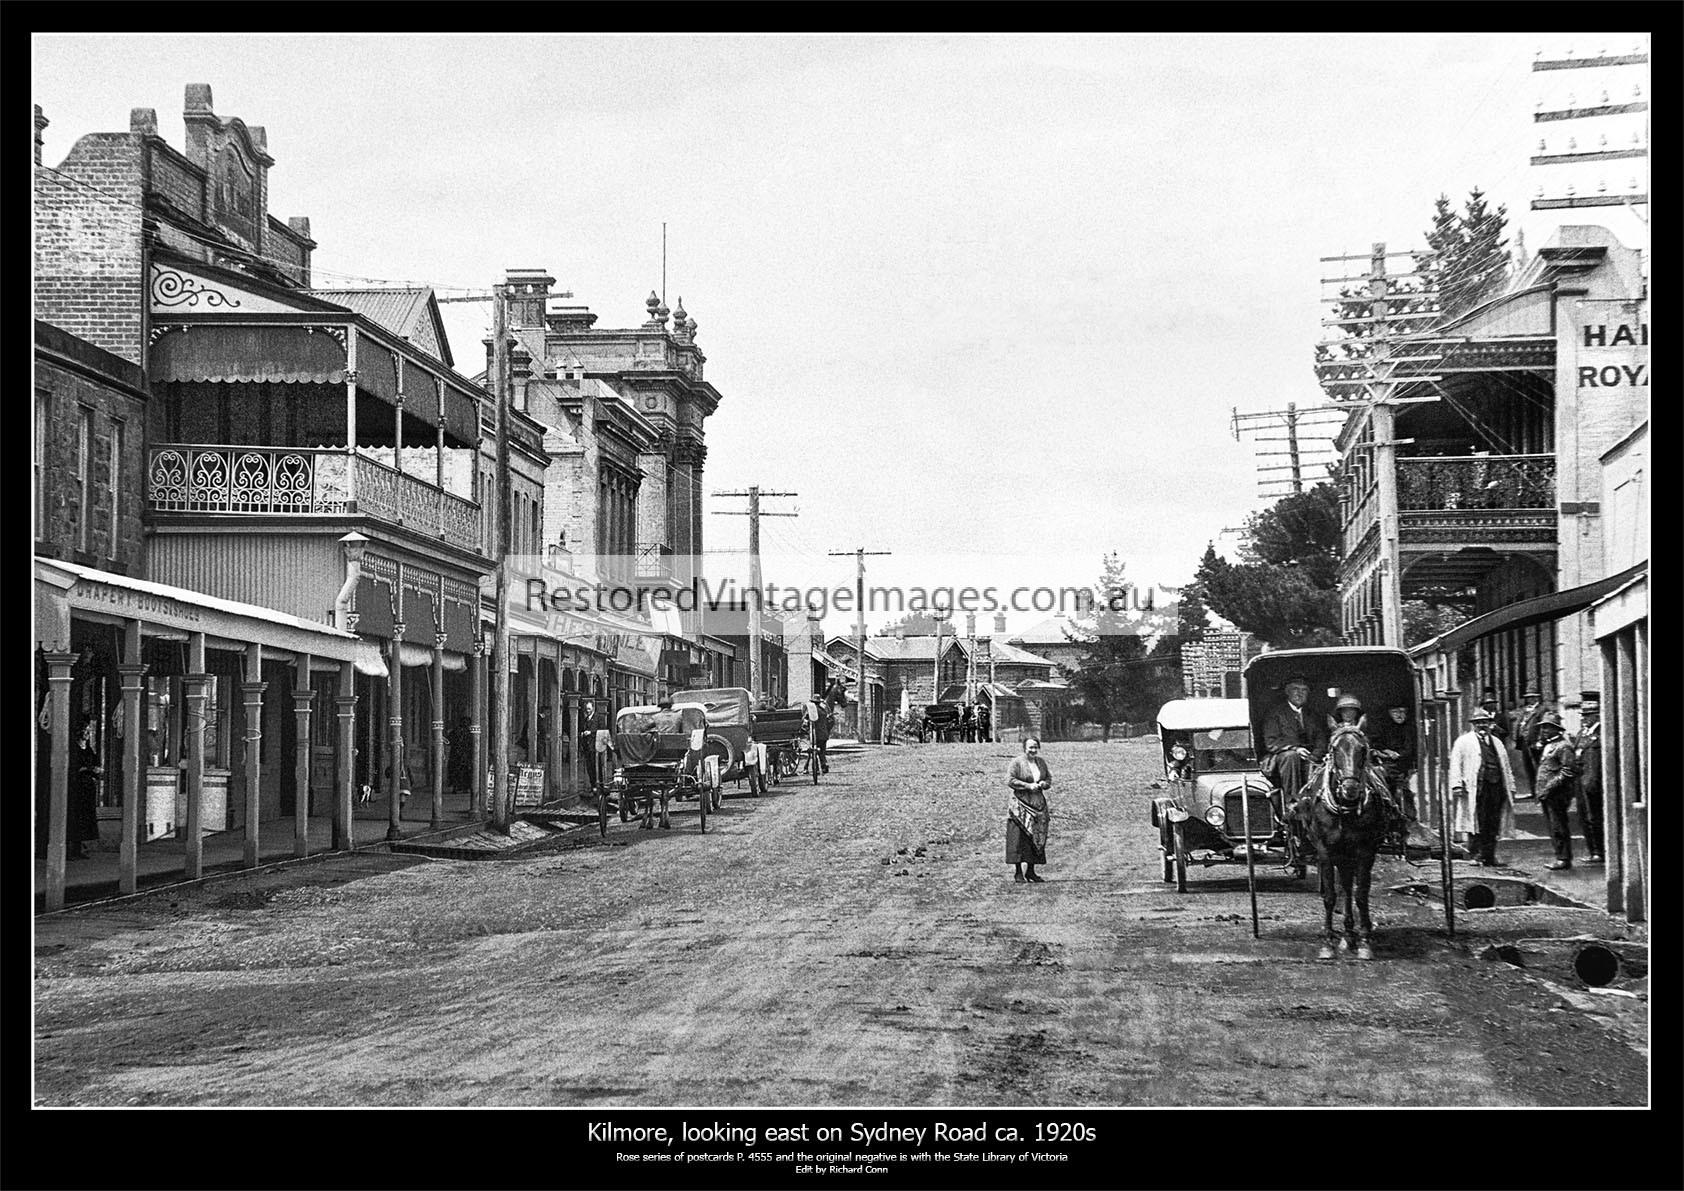 Kilmore, Looking East Along Sydney Street Ca. 1920